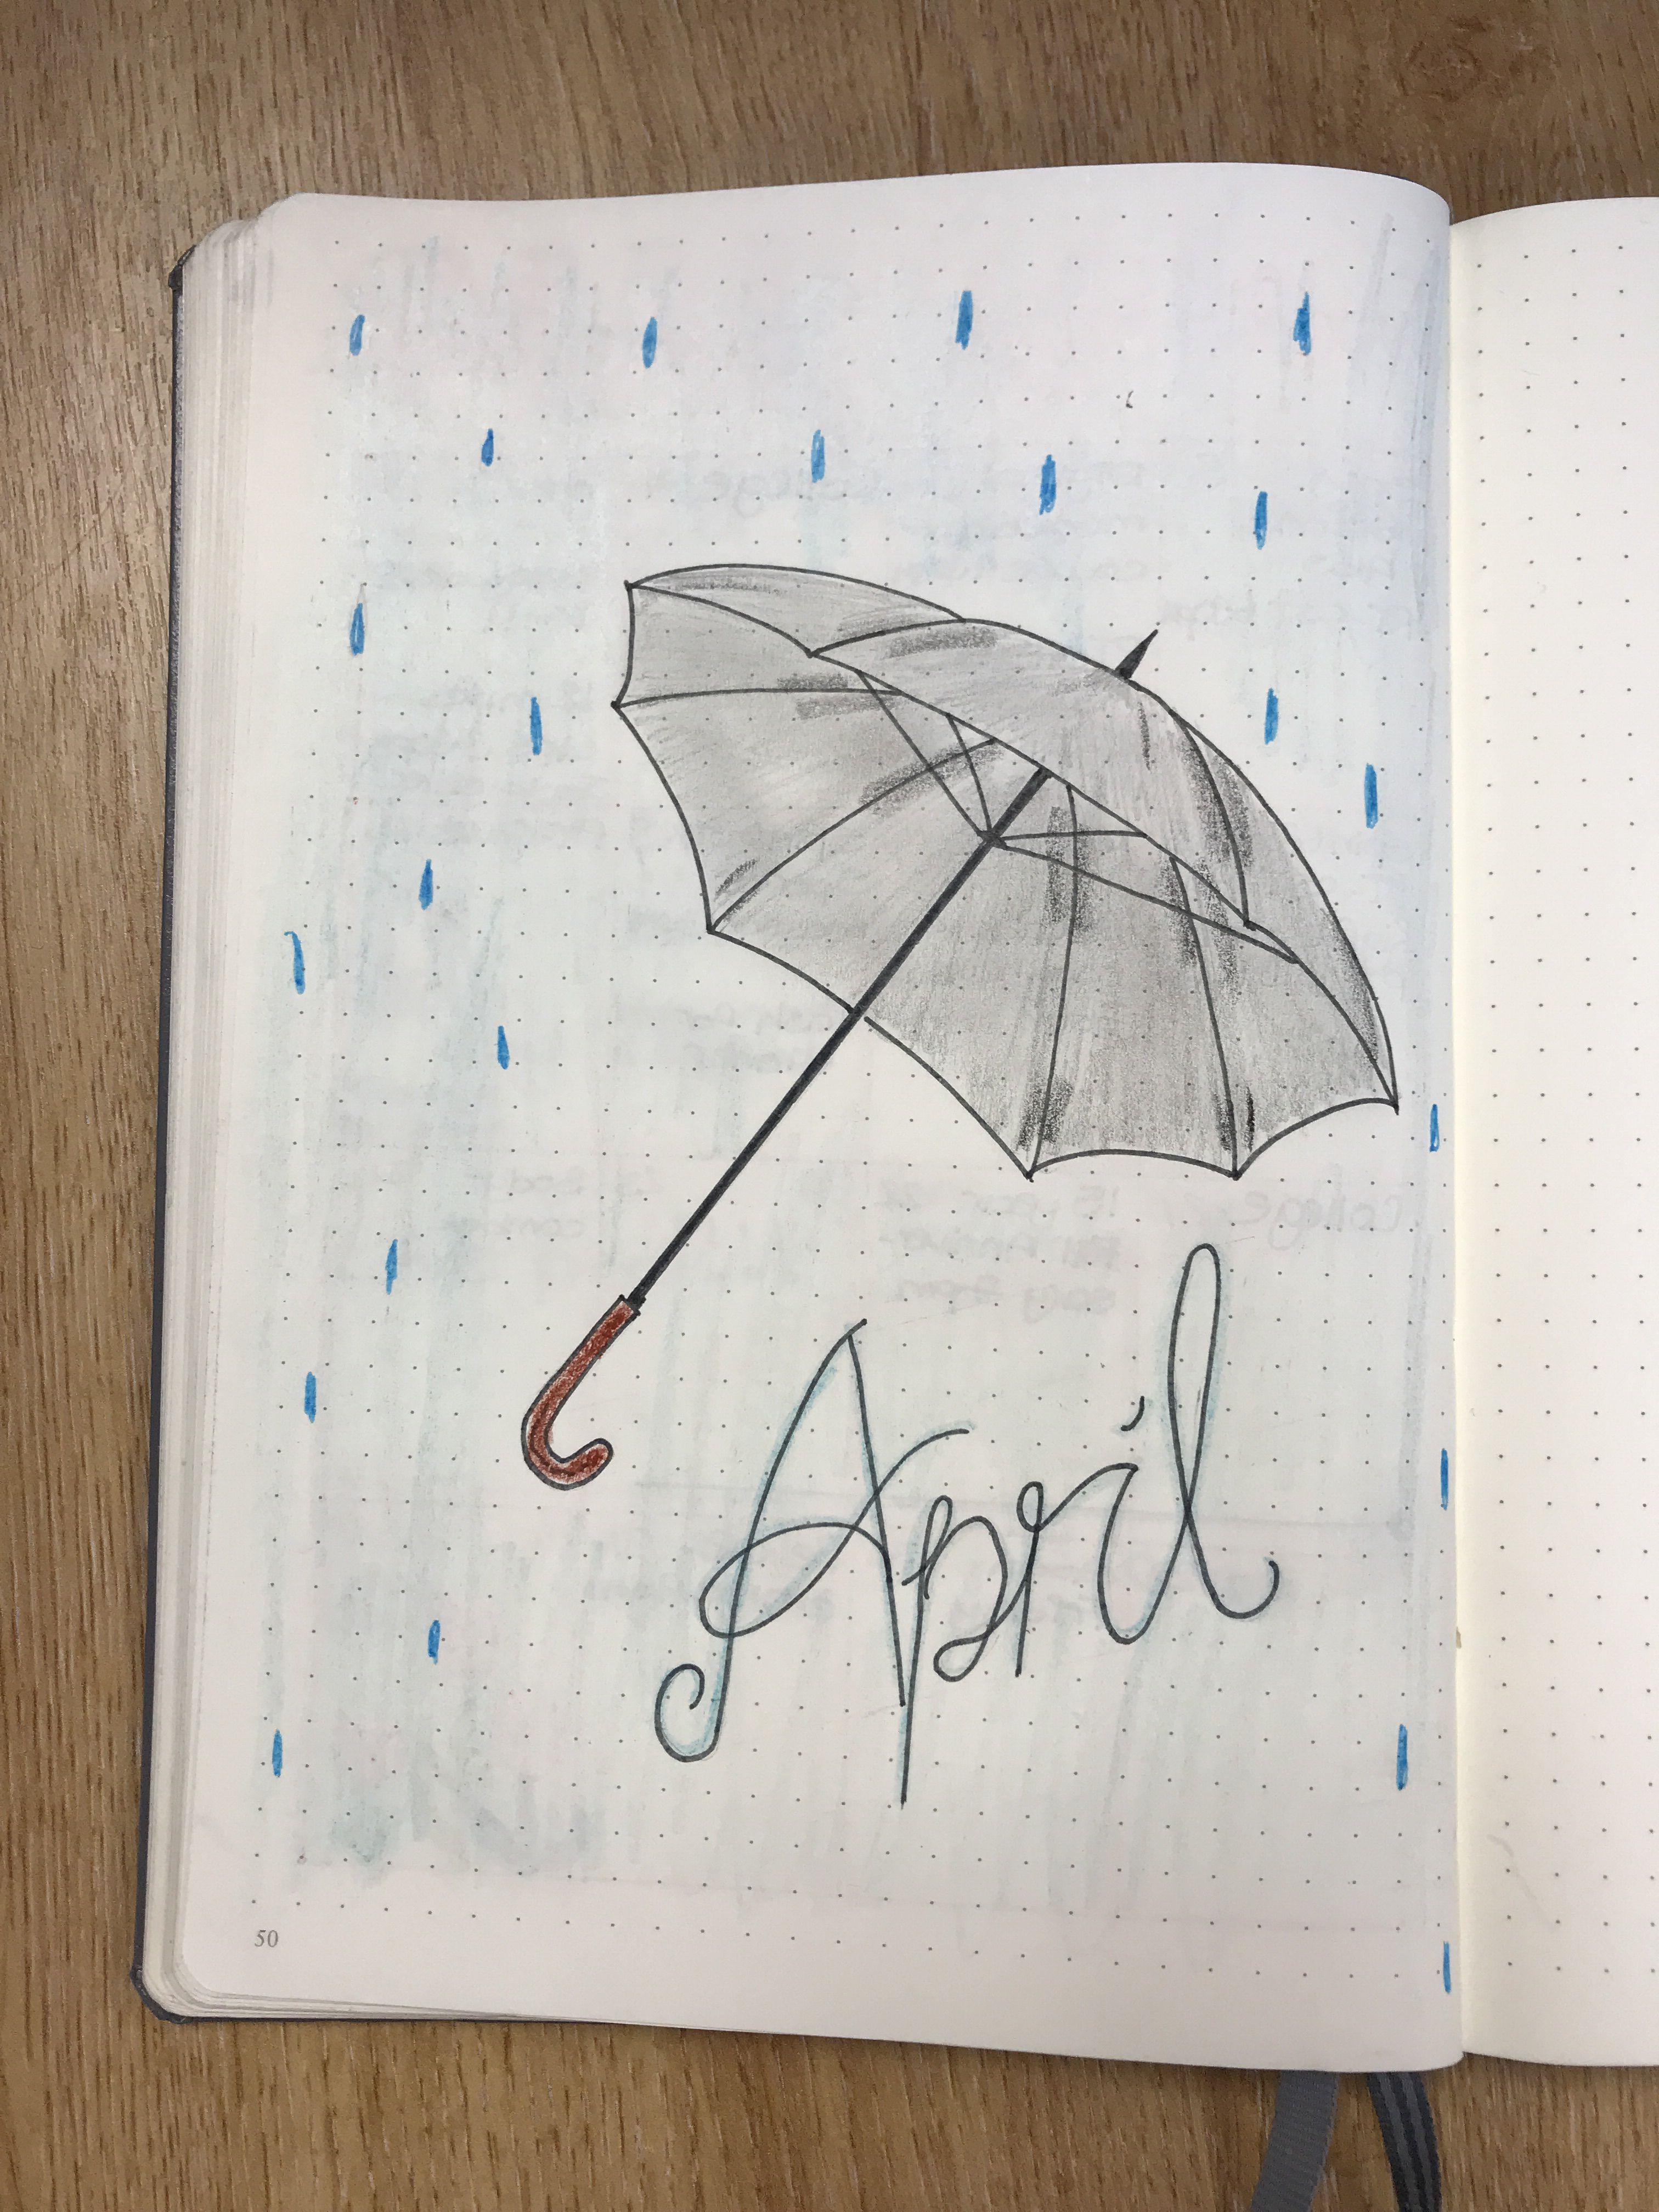 April cover page for bullet journal April Showers Aprilshowers